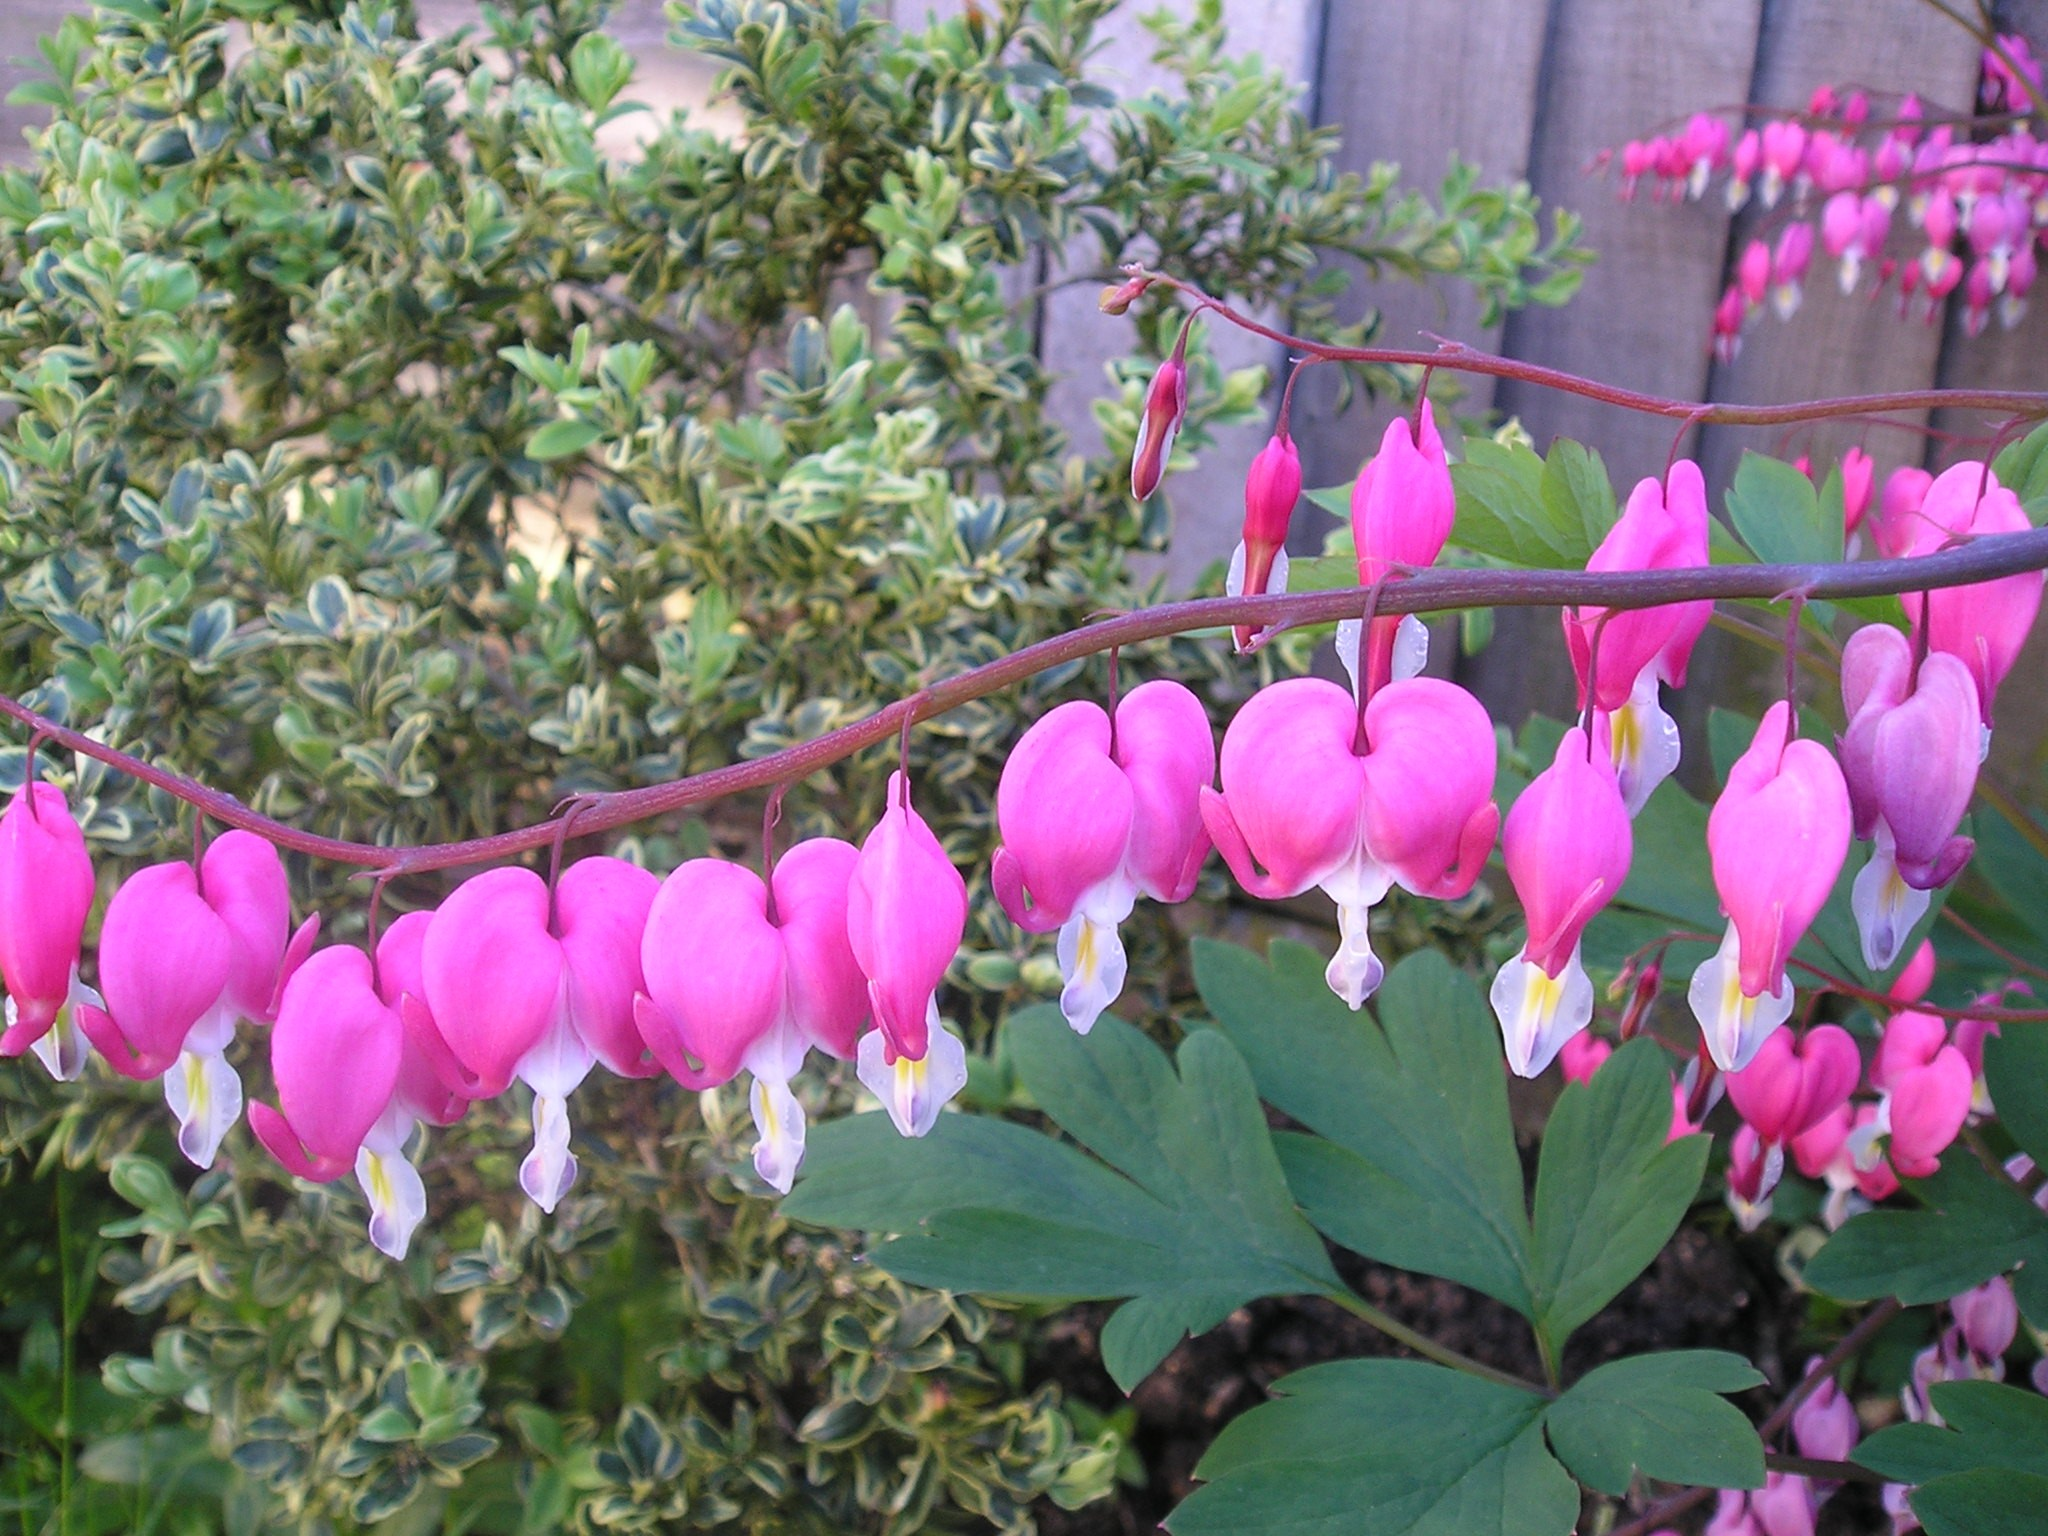 Dicentra spectablis bleeding heart garden and plant photos dicentra spectablis bleeding heart mightylinksfo